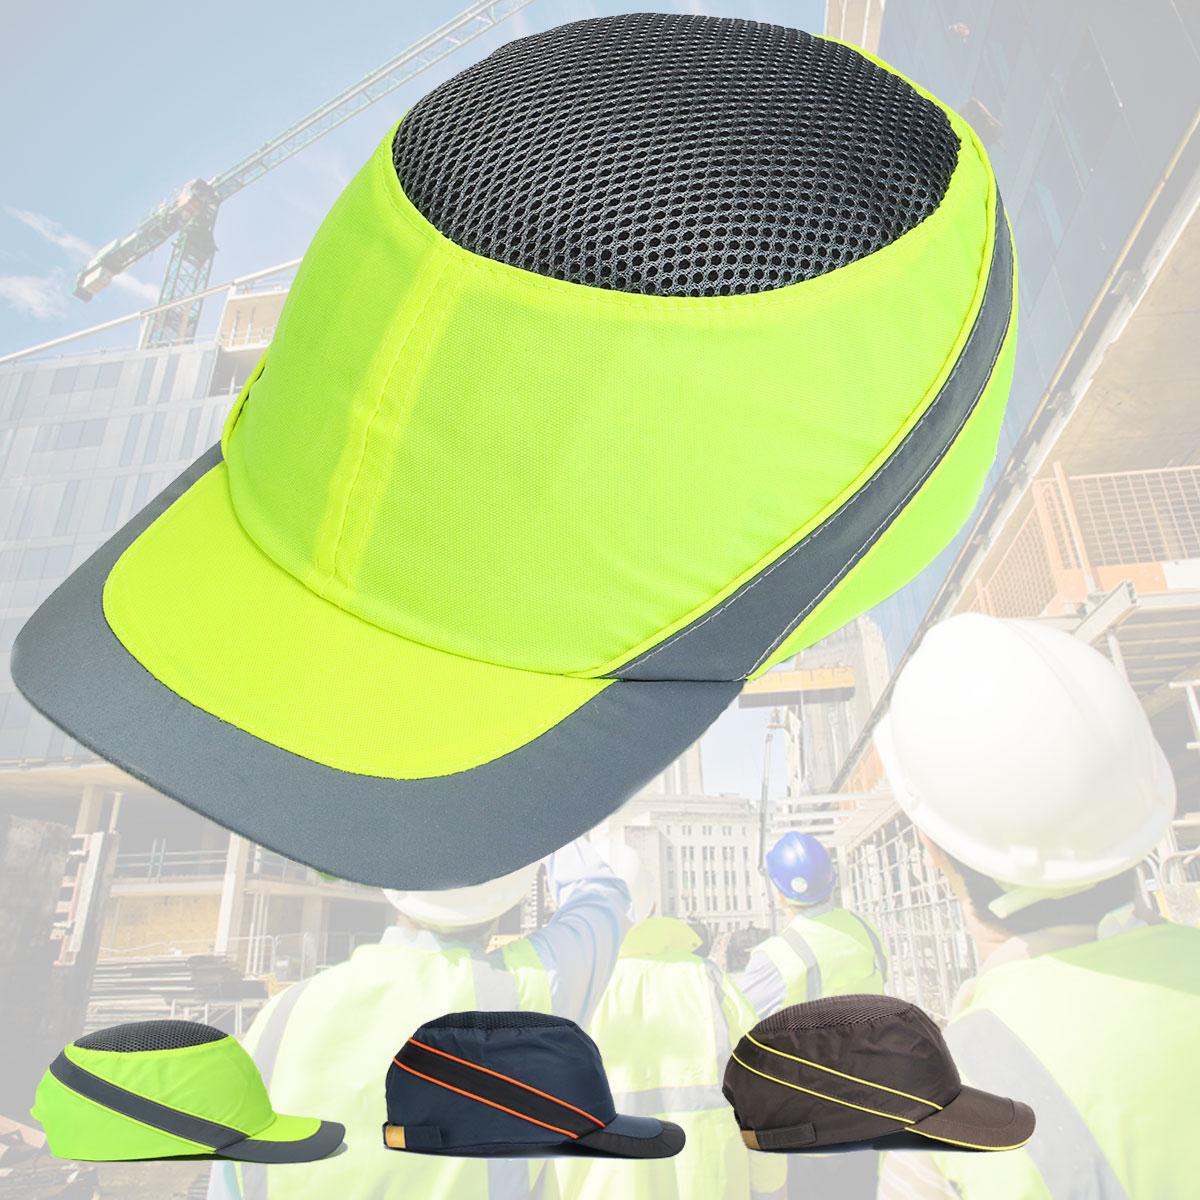 купить Fashion Sunscreen Cap Work Safety Helmet Breathable Security Anti-impact Light Weight Construction Helmet Self Defense Weapons по цене 864.25 рублей